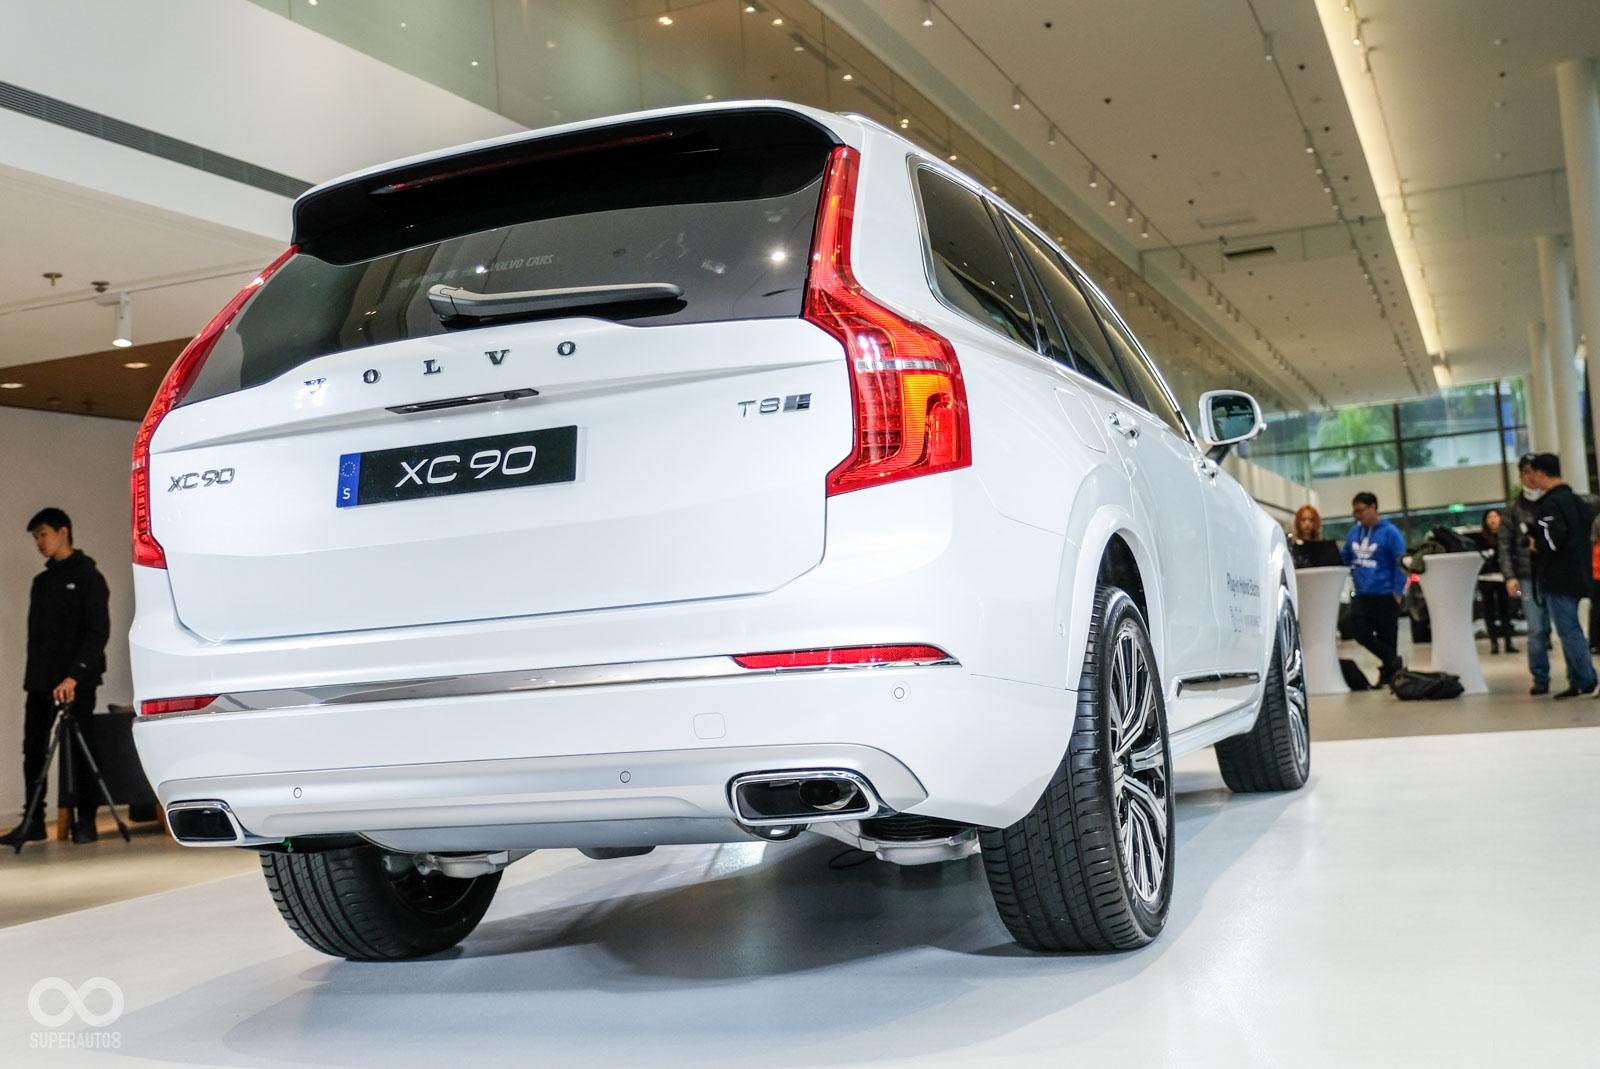 Volvo Xc90小改款提前現身 年底台北車展正式發表 Supermoto8